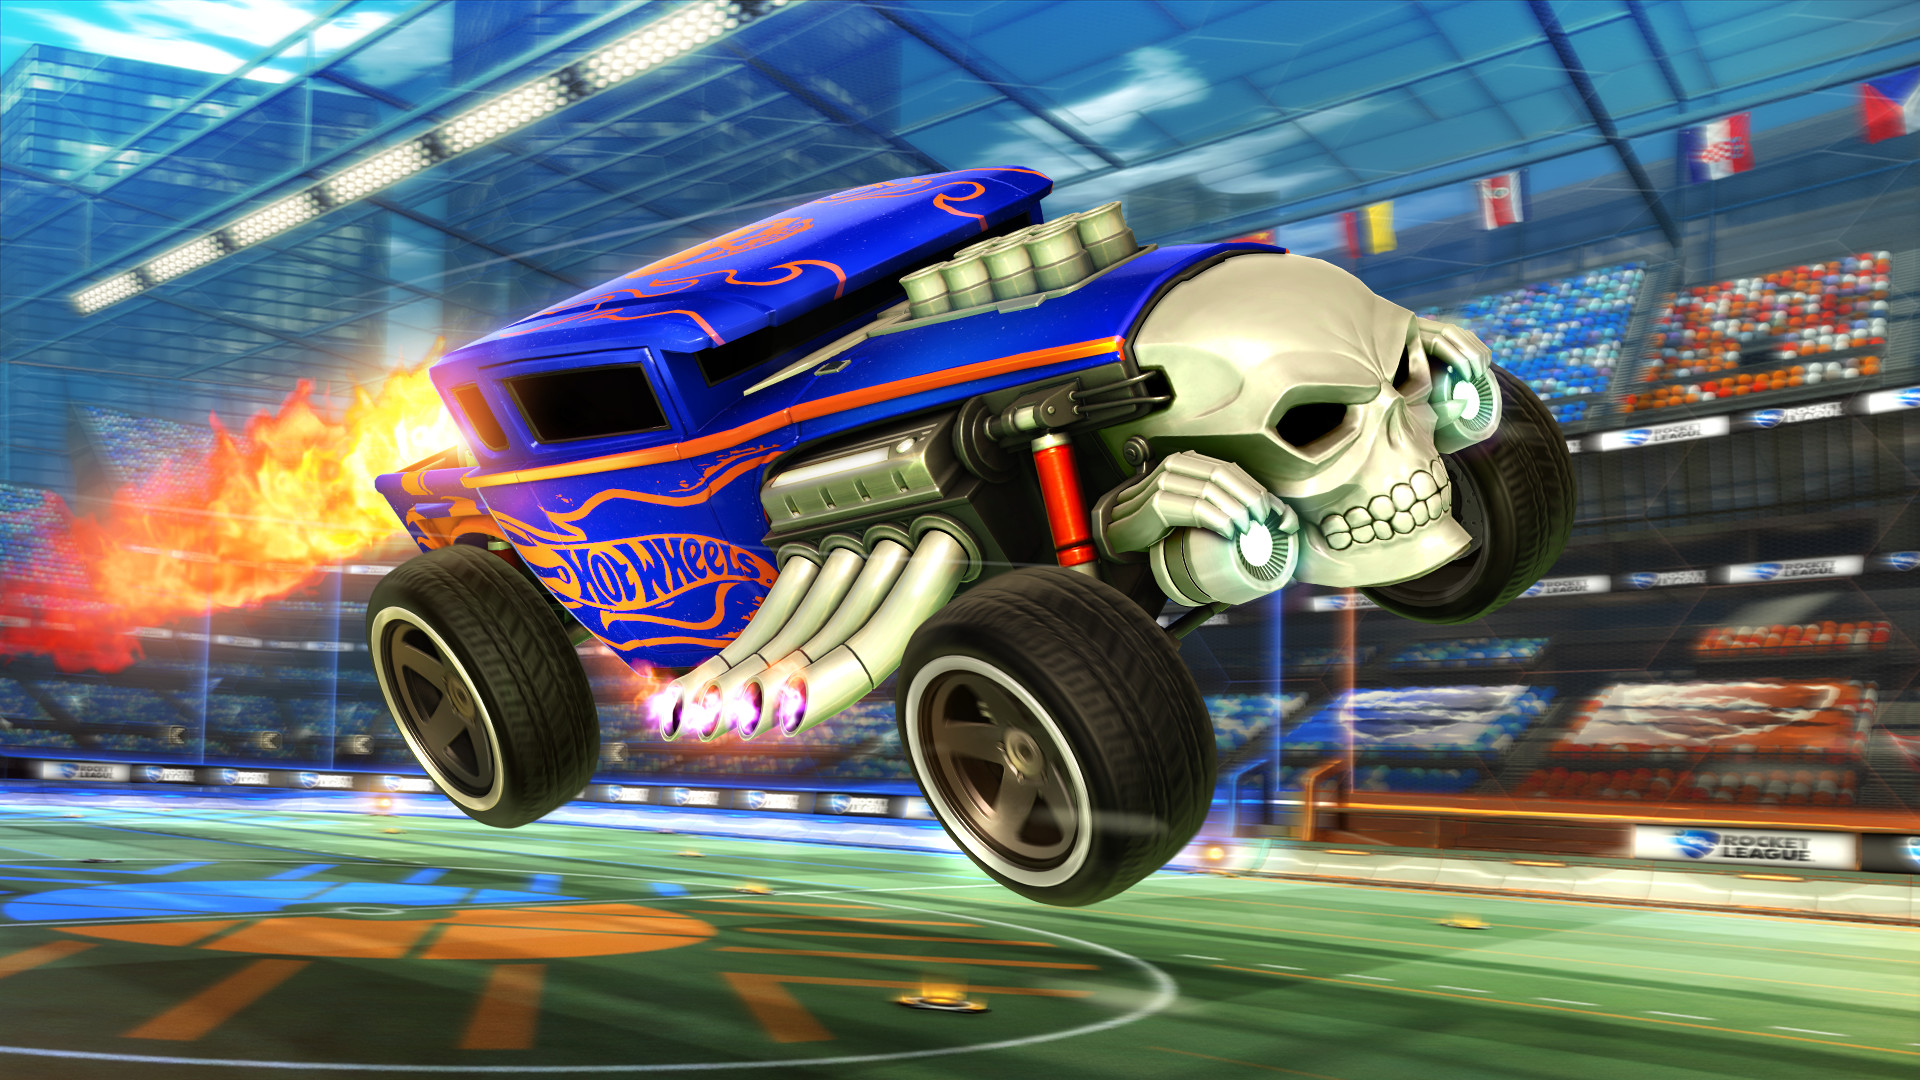 Rocket League - Hot Wheels Bone Shaker screenshot